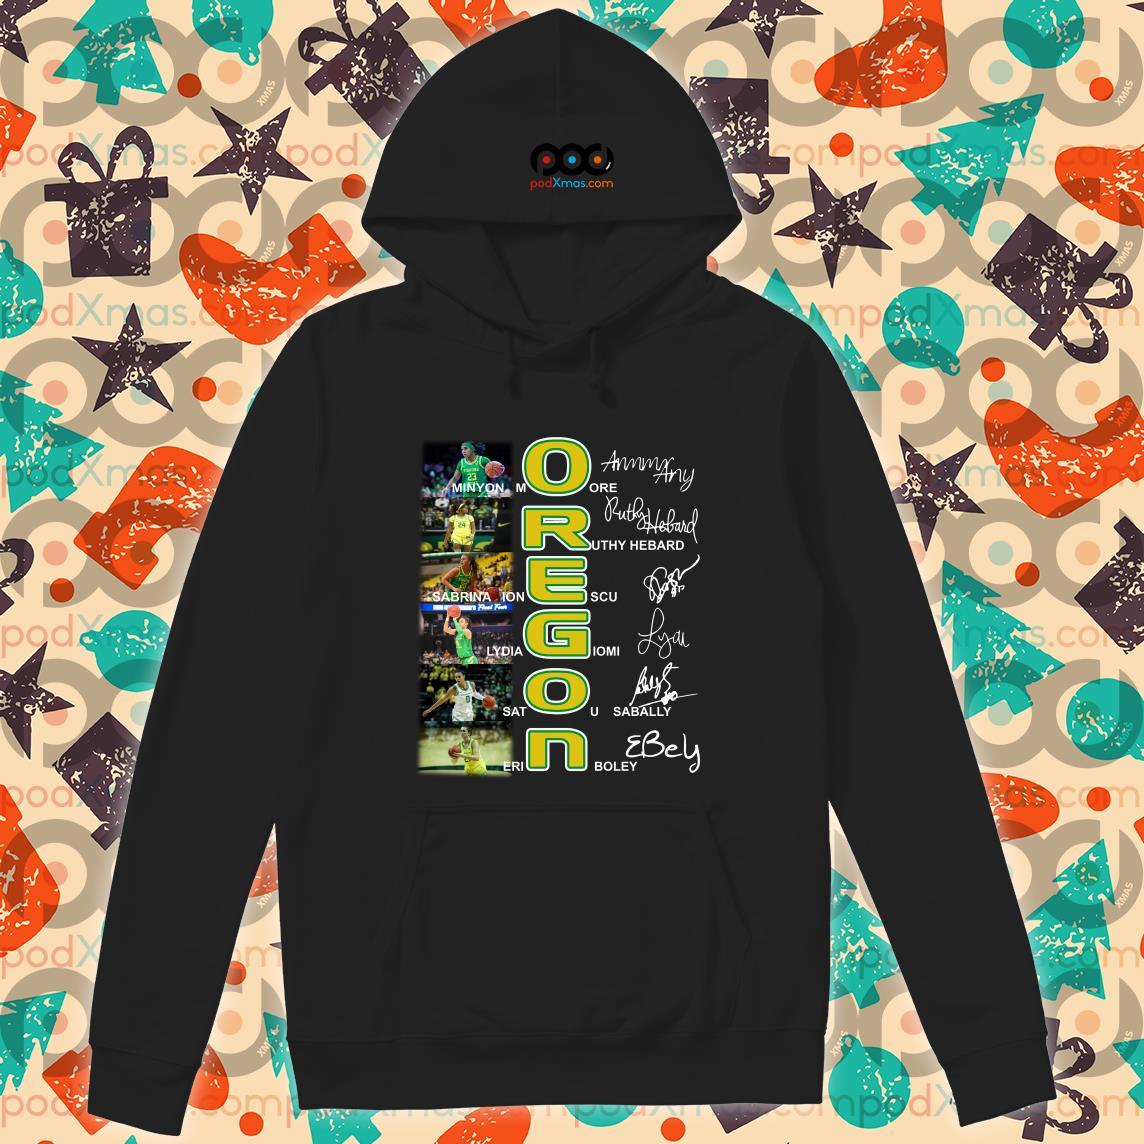 OREGON Minyon More Ruthy Hebard signatures T-hoodie